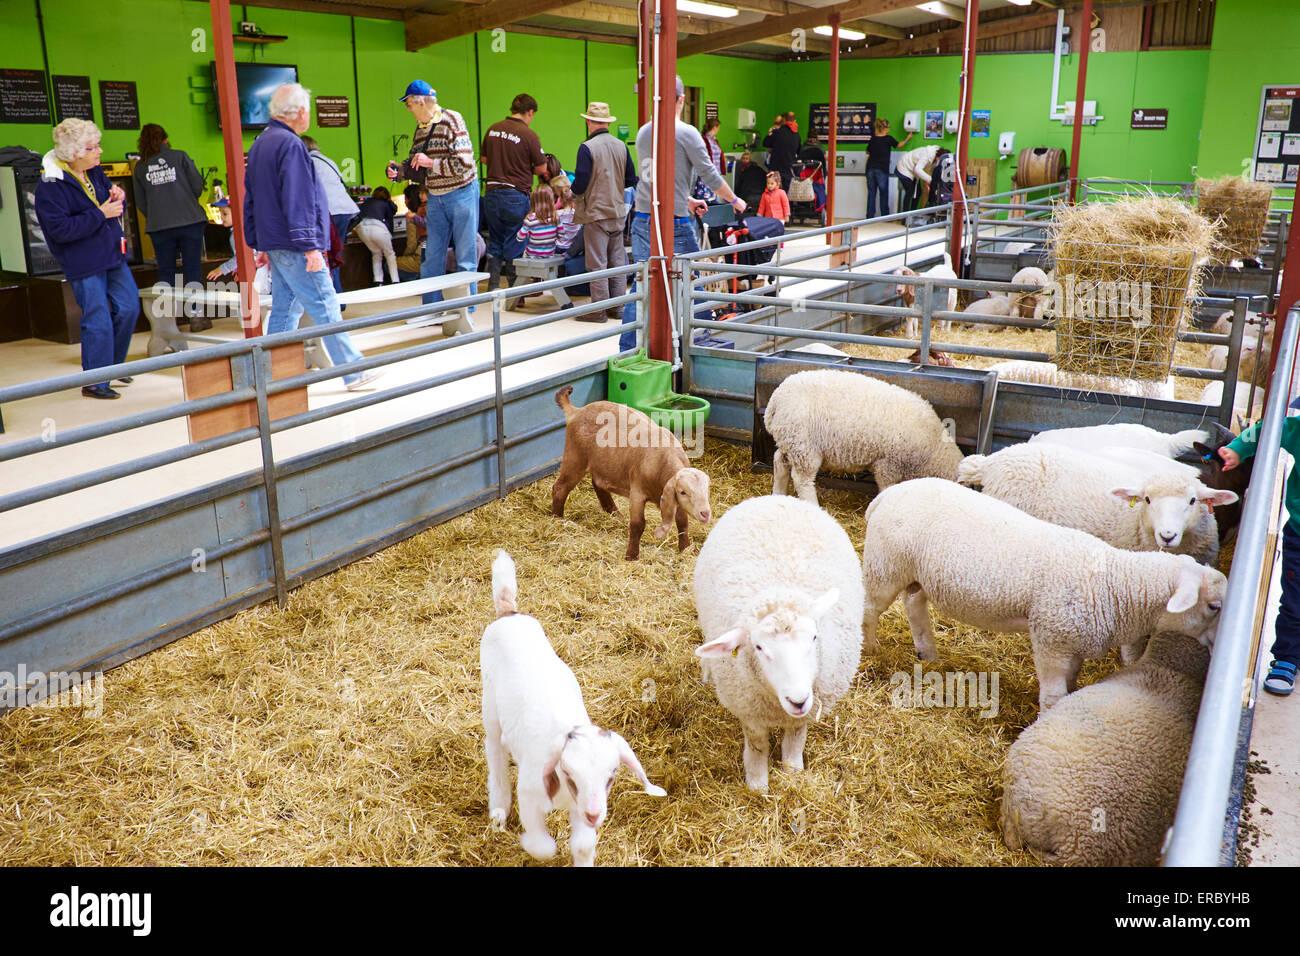 Inside The Touch Barn At Cotswold Farm Park Bemborough Kineton UK